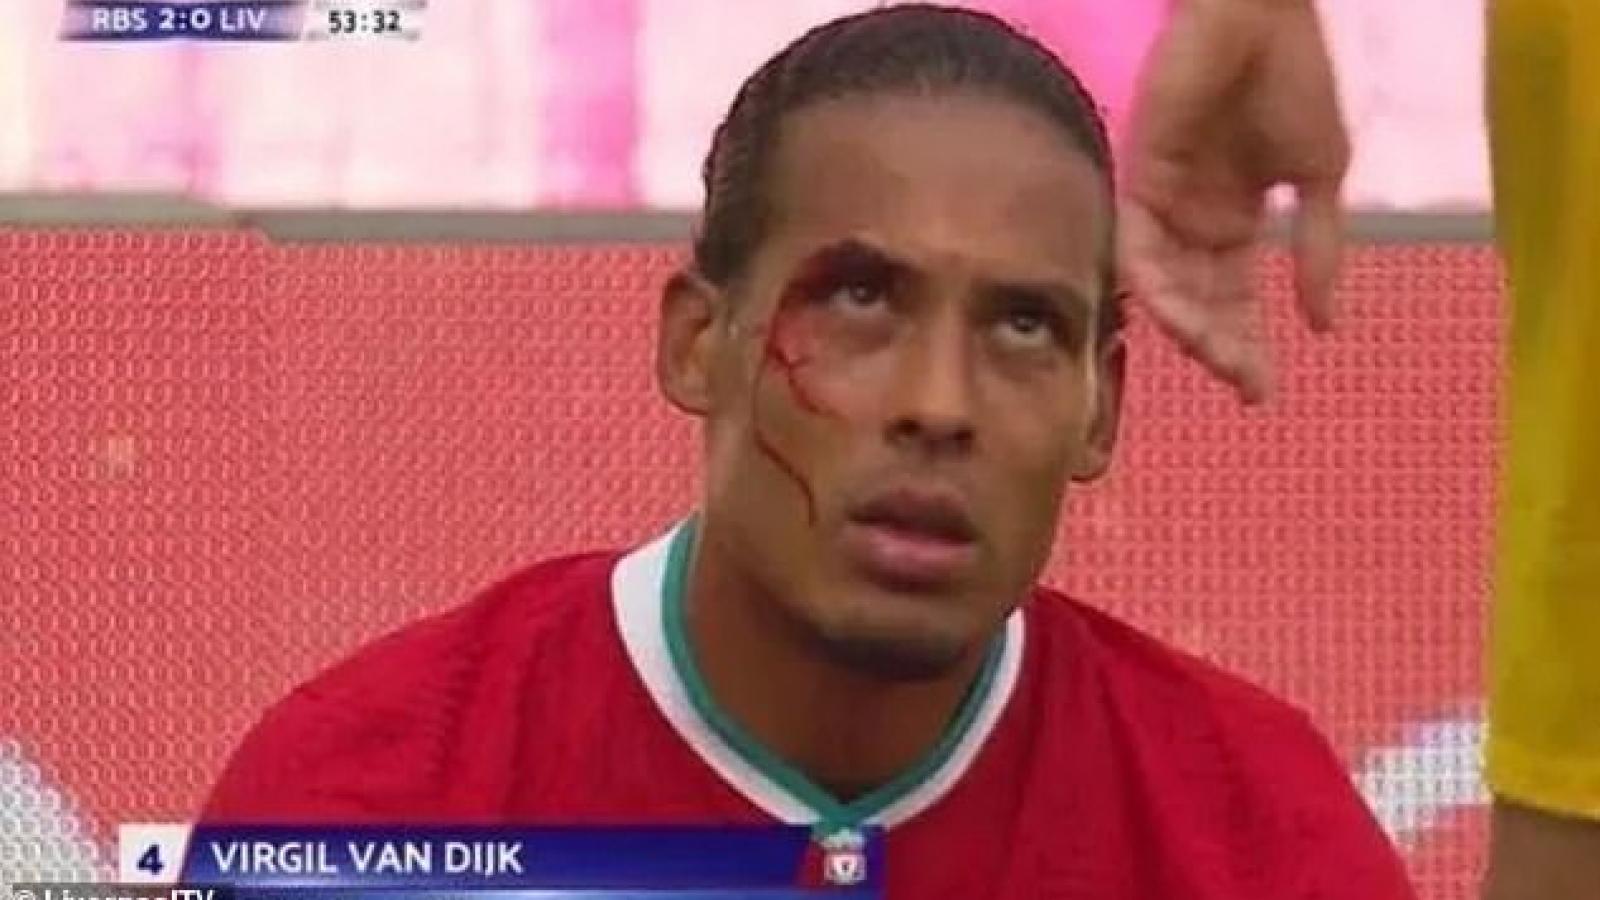 Virgil van Dijk đổ máu ở trận đấu với RB Salzburg